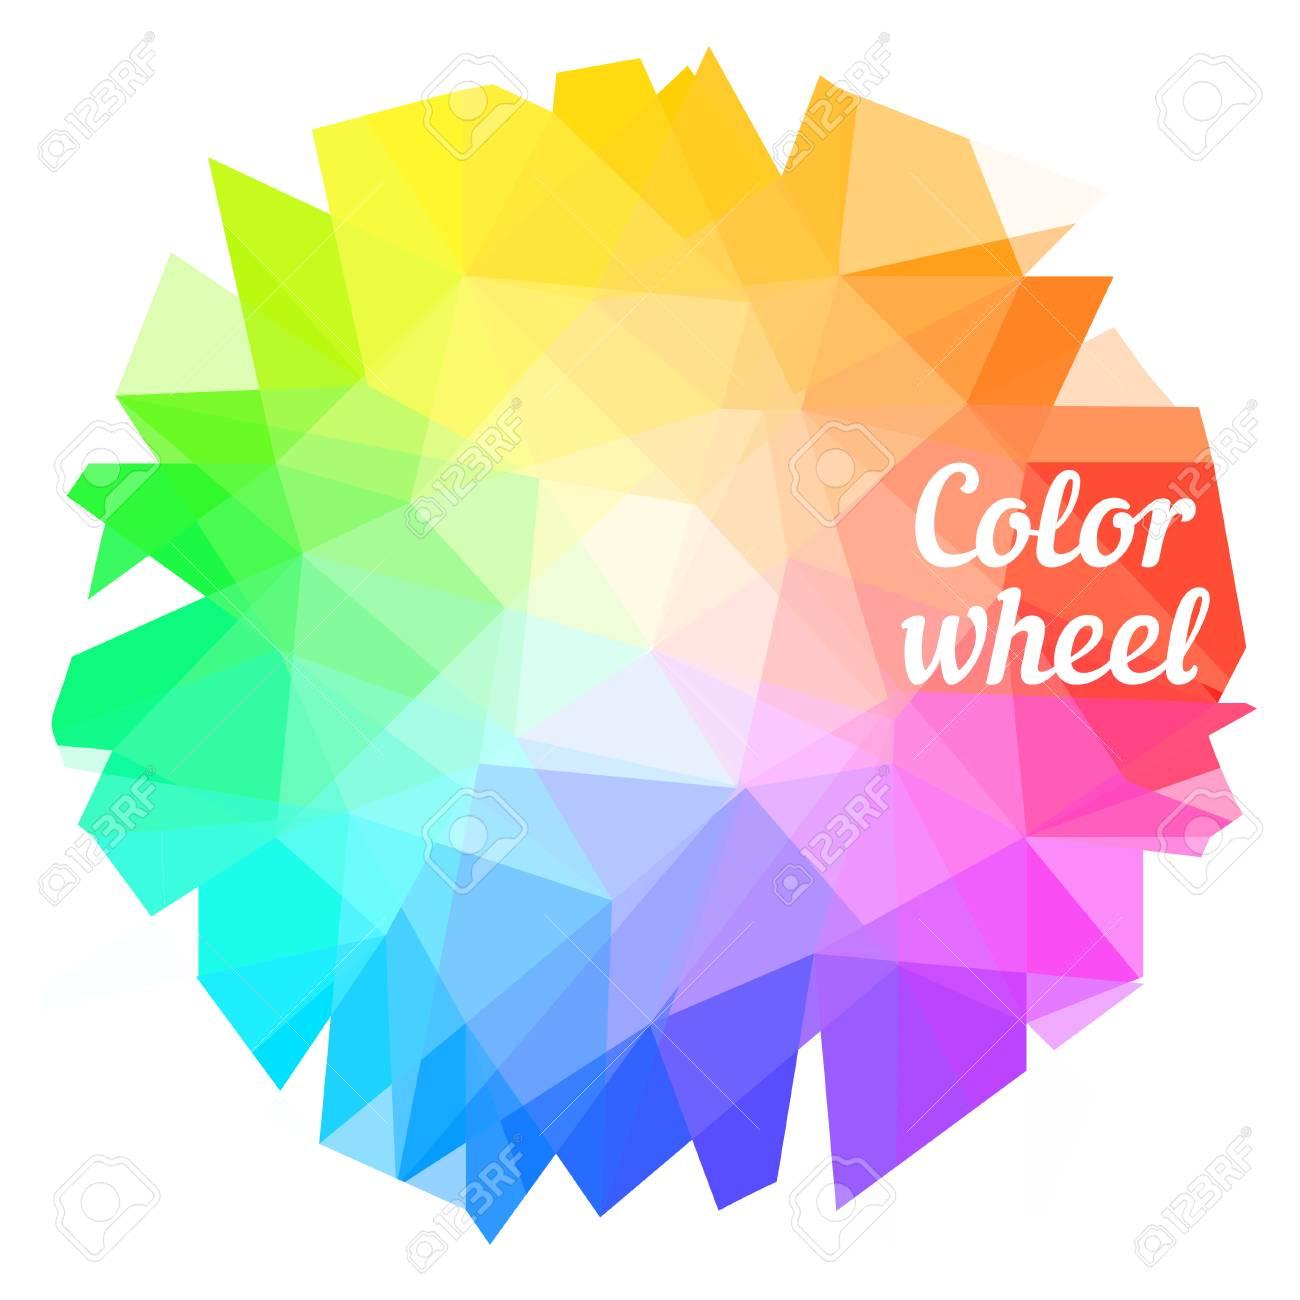 Creative Color Wheel Vector Illustration Royalty Free Cliparts